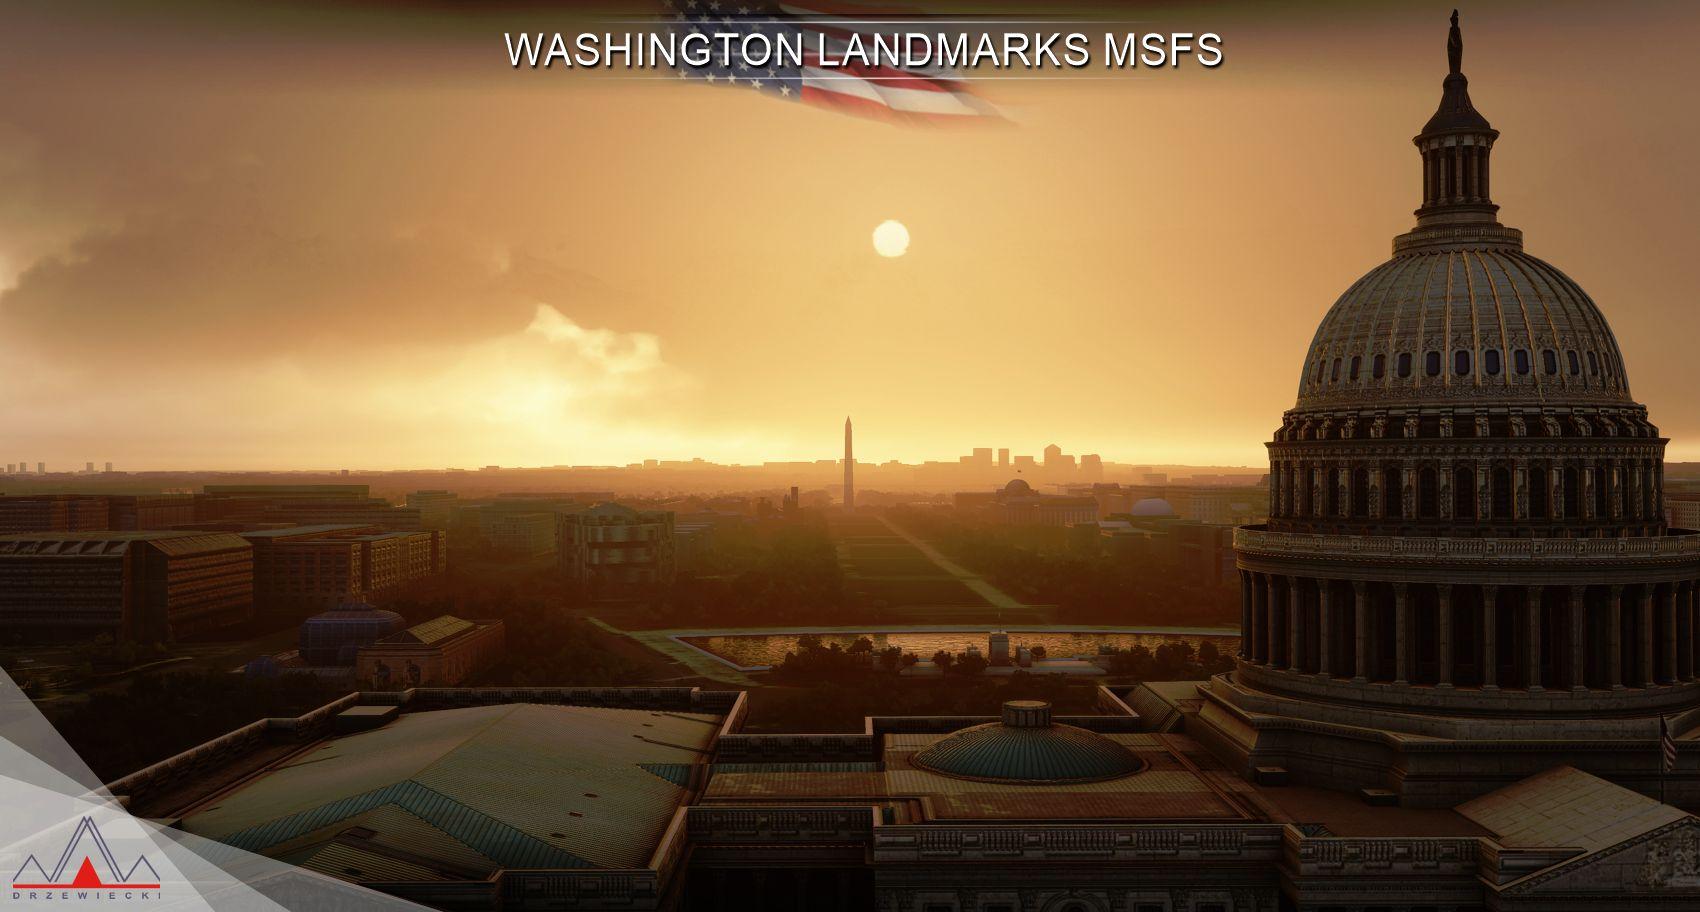 MSFS Washington Landmarks